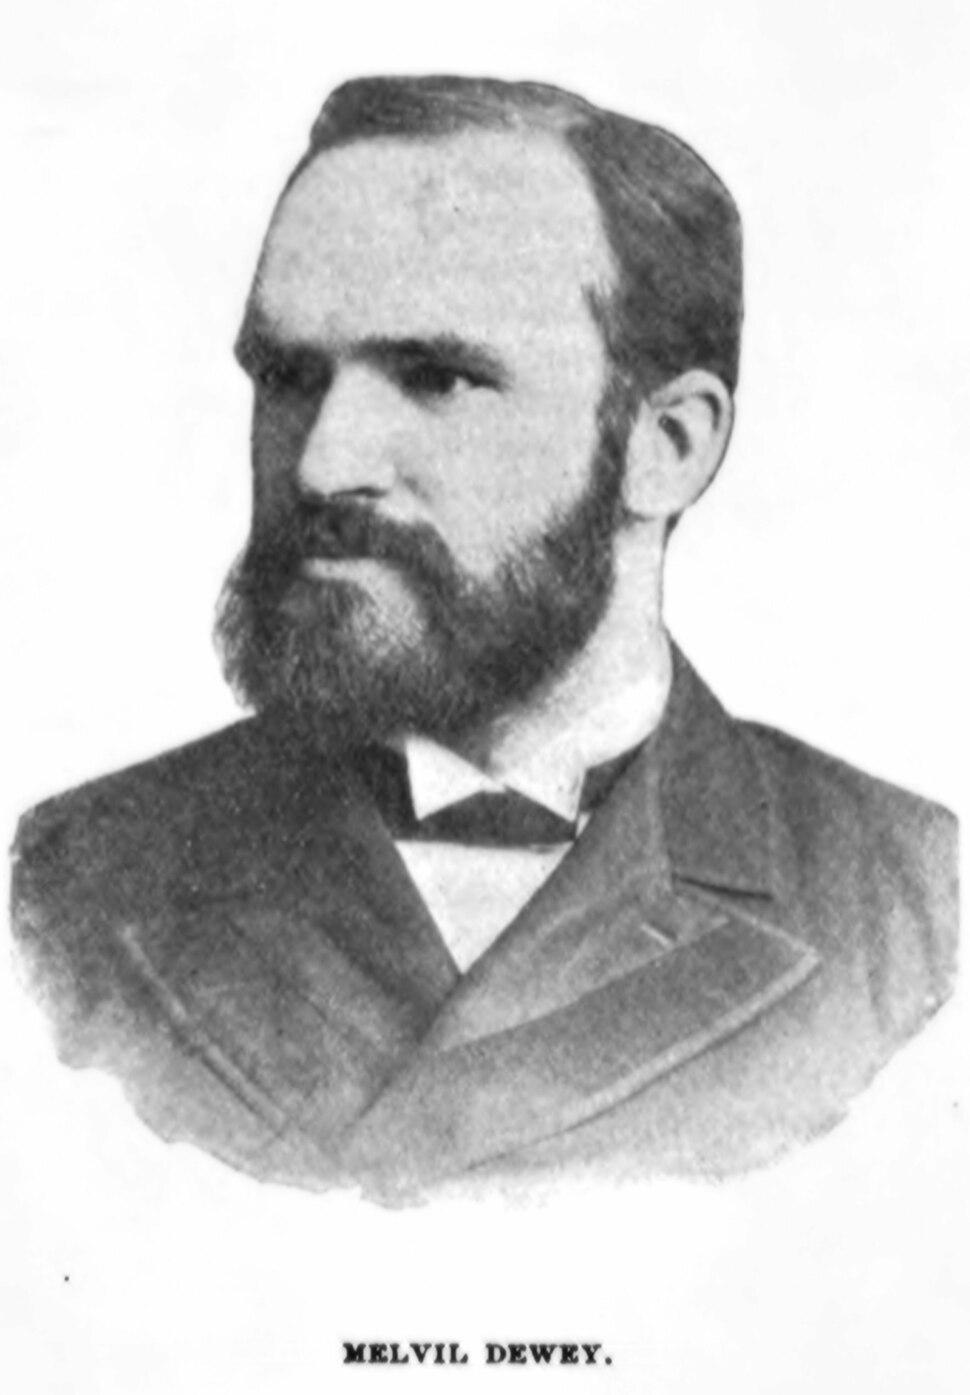 Melvil Dewey 1891